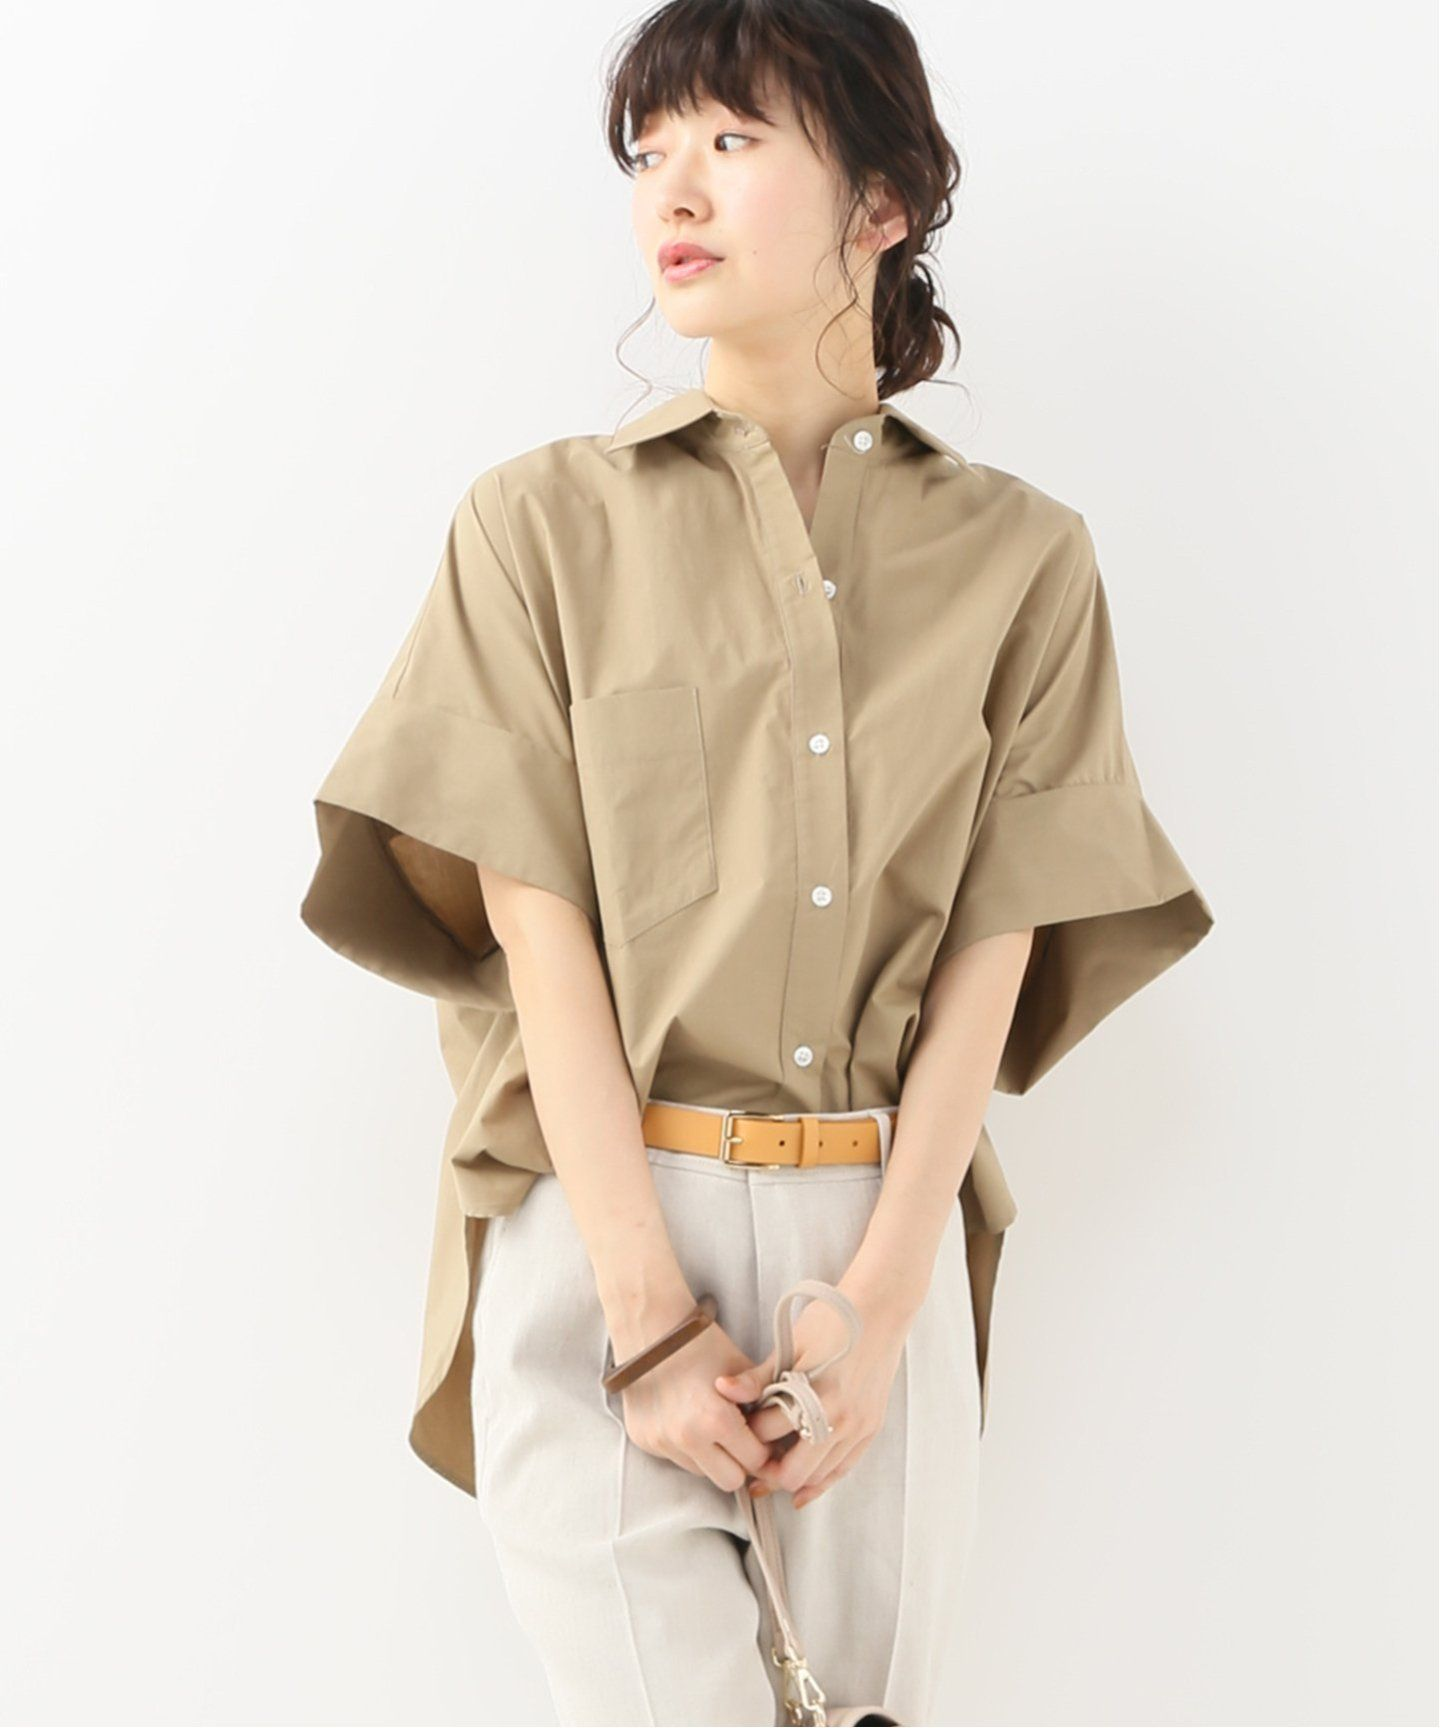 secular short sleeve button up shirt spick and span スピック スパン 公式のファッション通販 19050210000310 baycrew s store ファッション ファッション通販 ポプリン